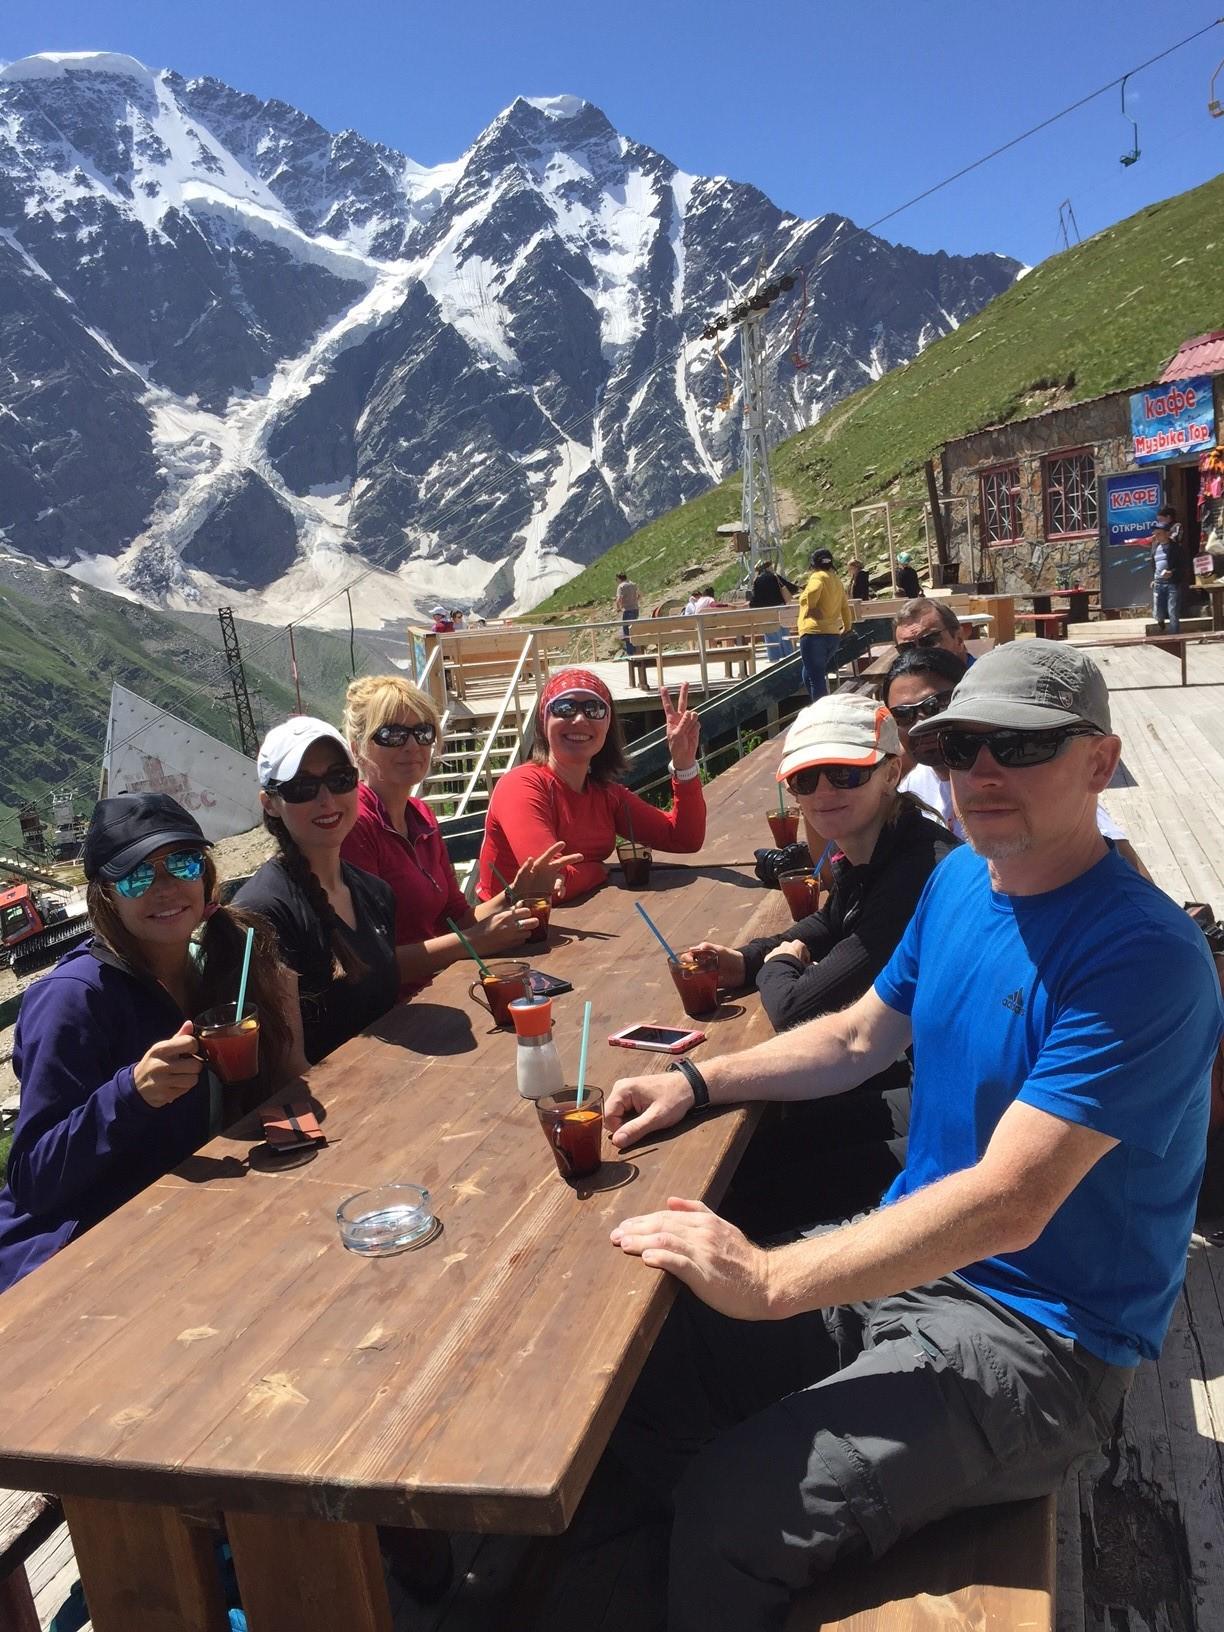 Elbrus team at Cheget ski area eating shashlik (Mike Hamill)